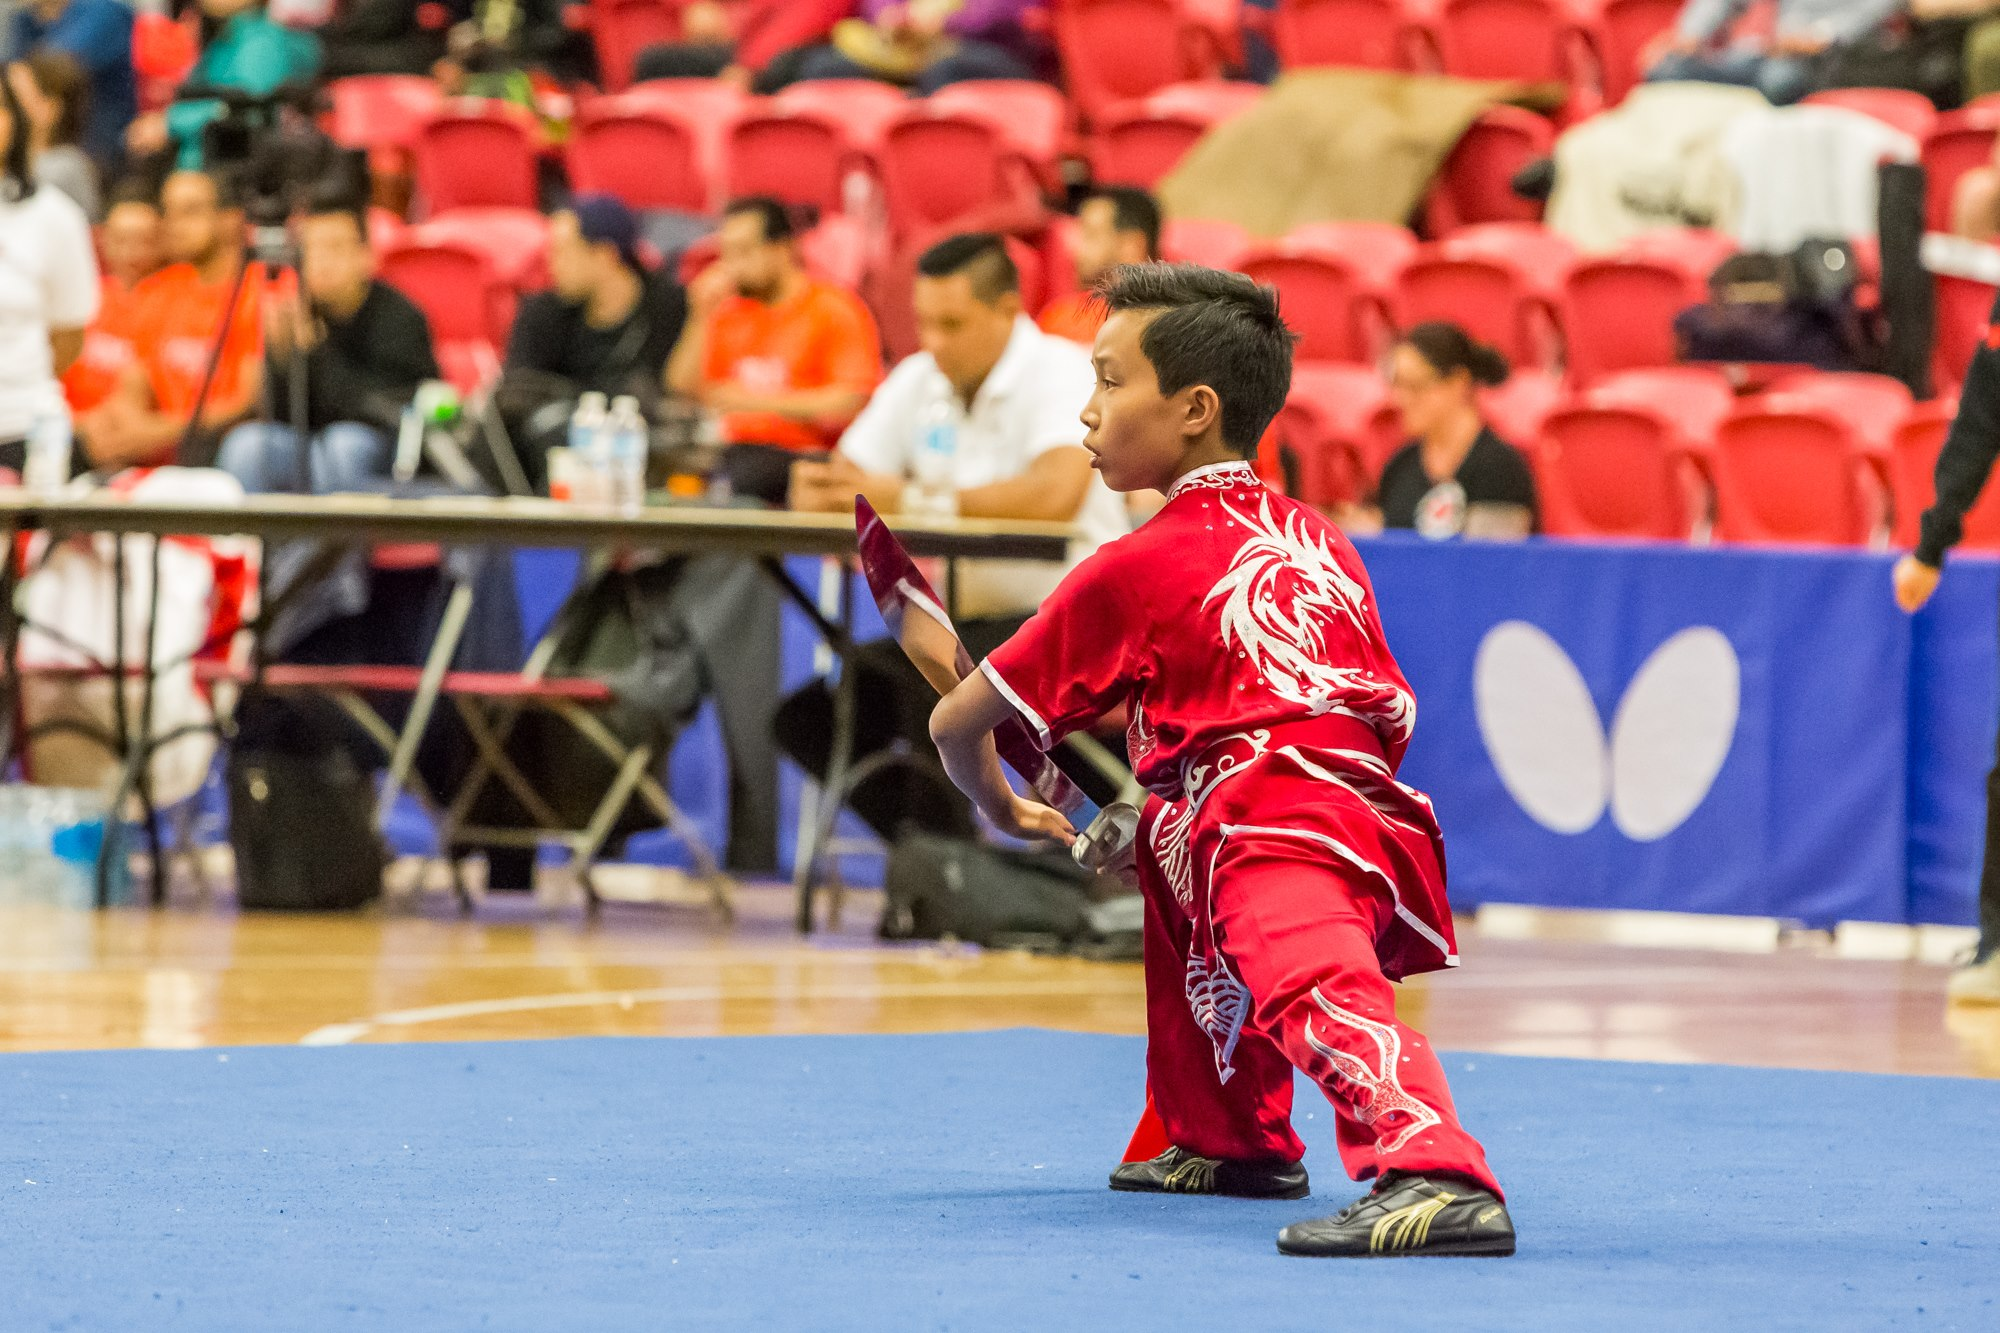 wayland-li-wushu-toronto-markham-canadian-wushu-championships-2017-daoshu-7.jpg